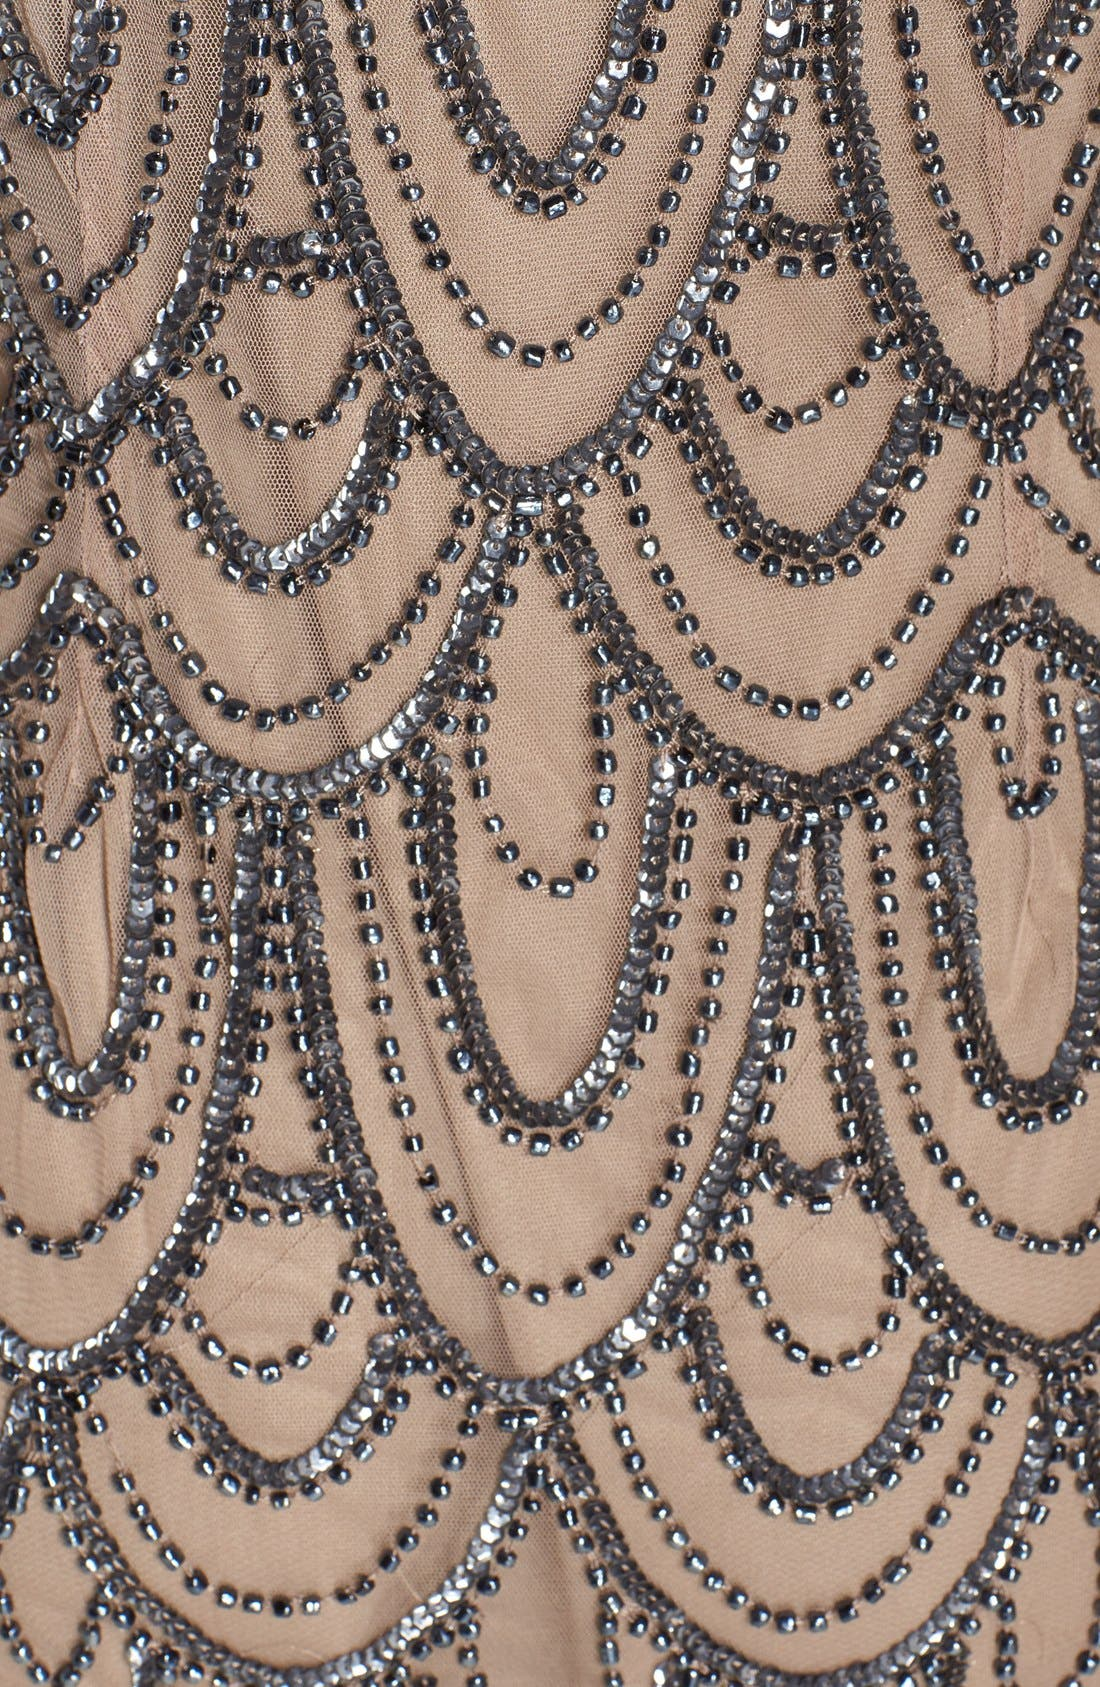 Embellished Mesh Sheath Dress,                             Alternate thumbnail 74, color,